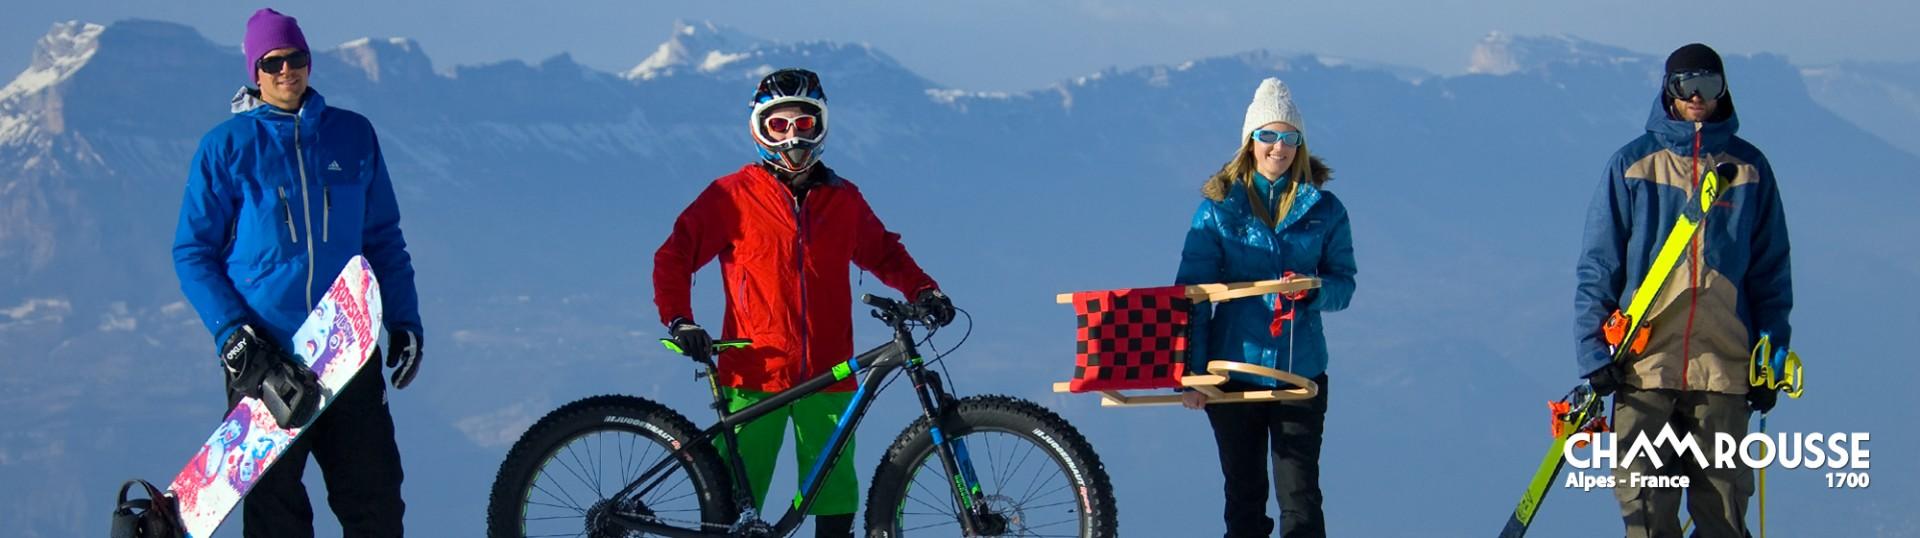 Winter Aktivitäten in Chamrousse